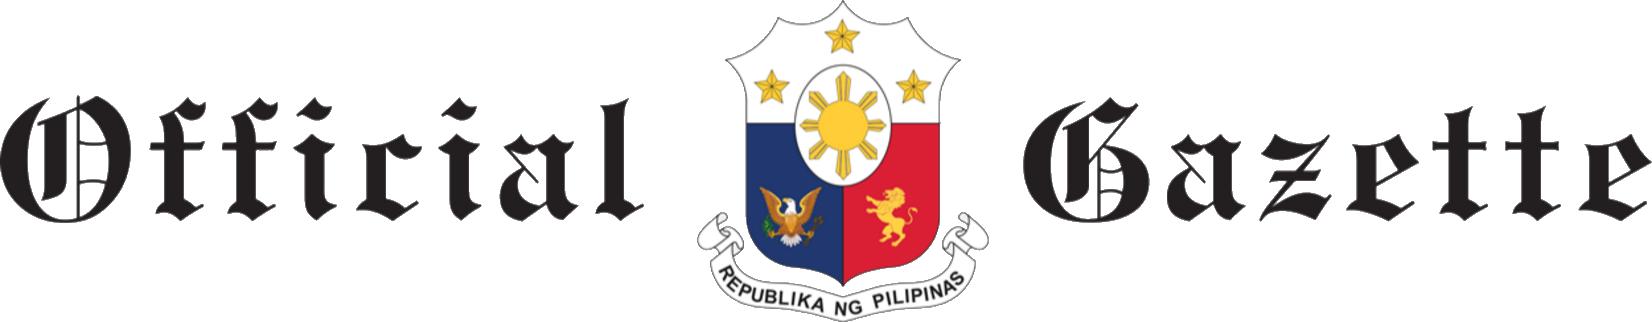 Fileofficial Gazette Philippines Titleg Wikimedia Commons